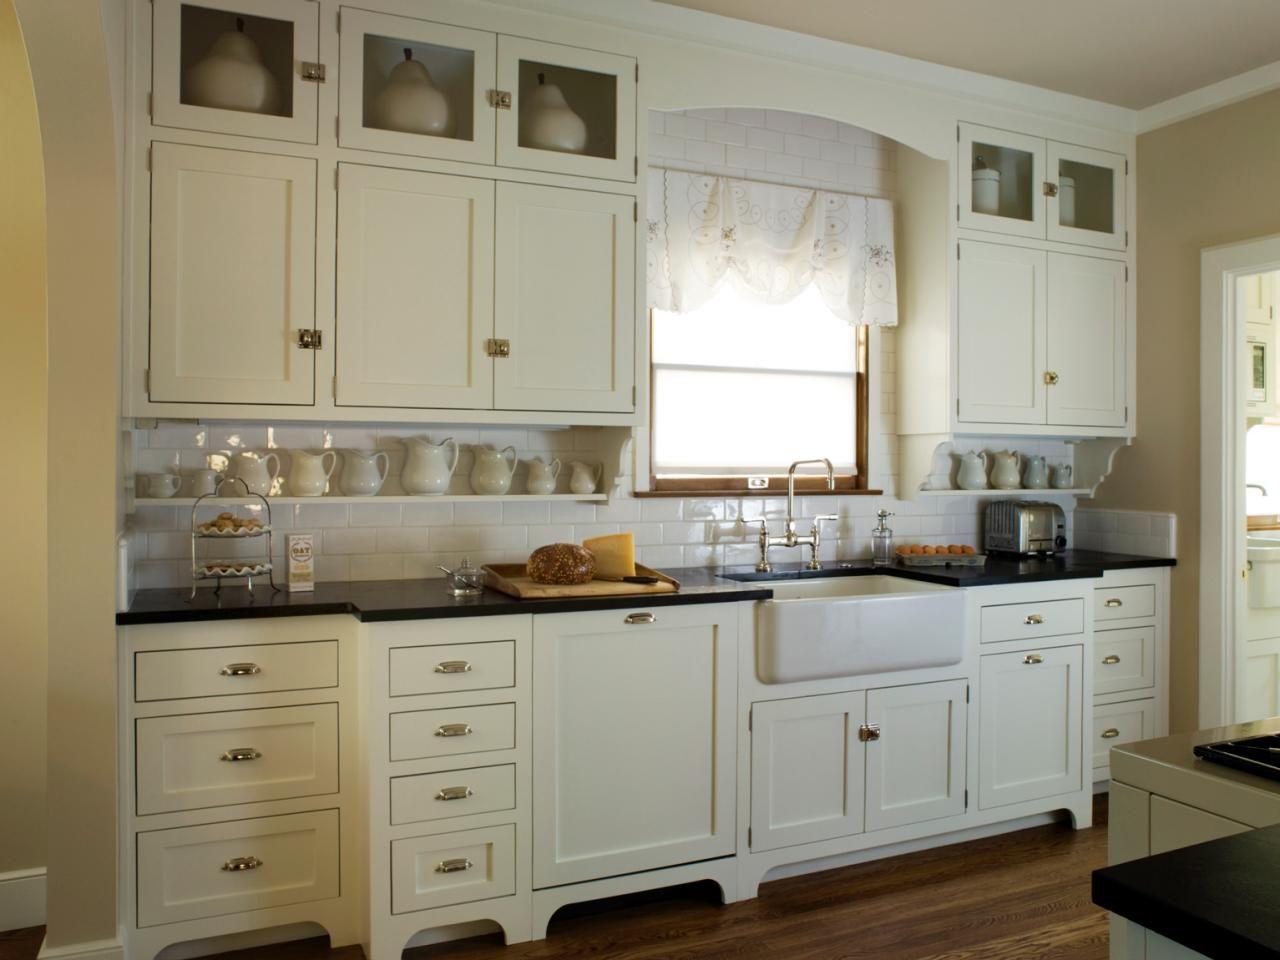 Best Kitchen Gallery: 27 Antique White Kitchen Cabi S Amazing Photos Gallery White of Antique White Shaker Kitchen Cabinets on cal-ite.com